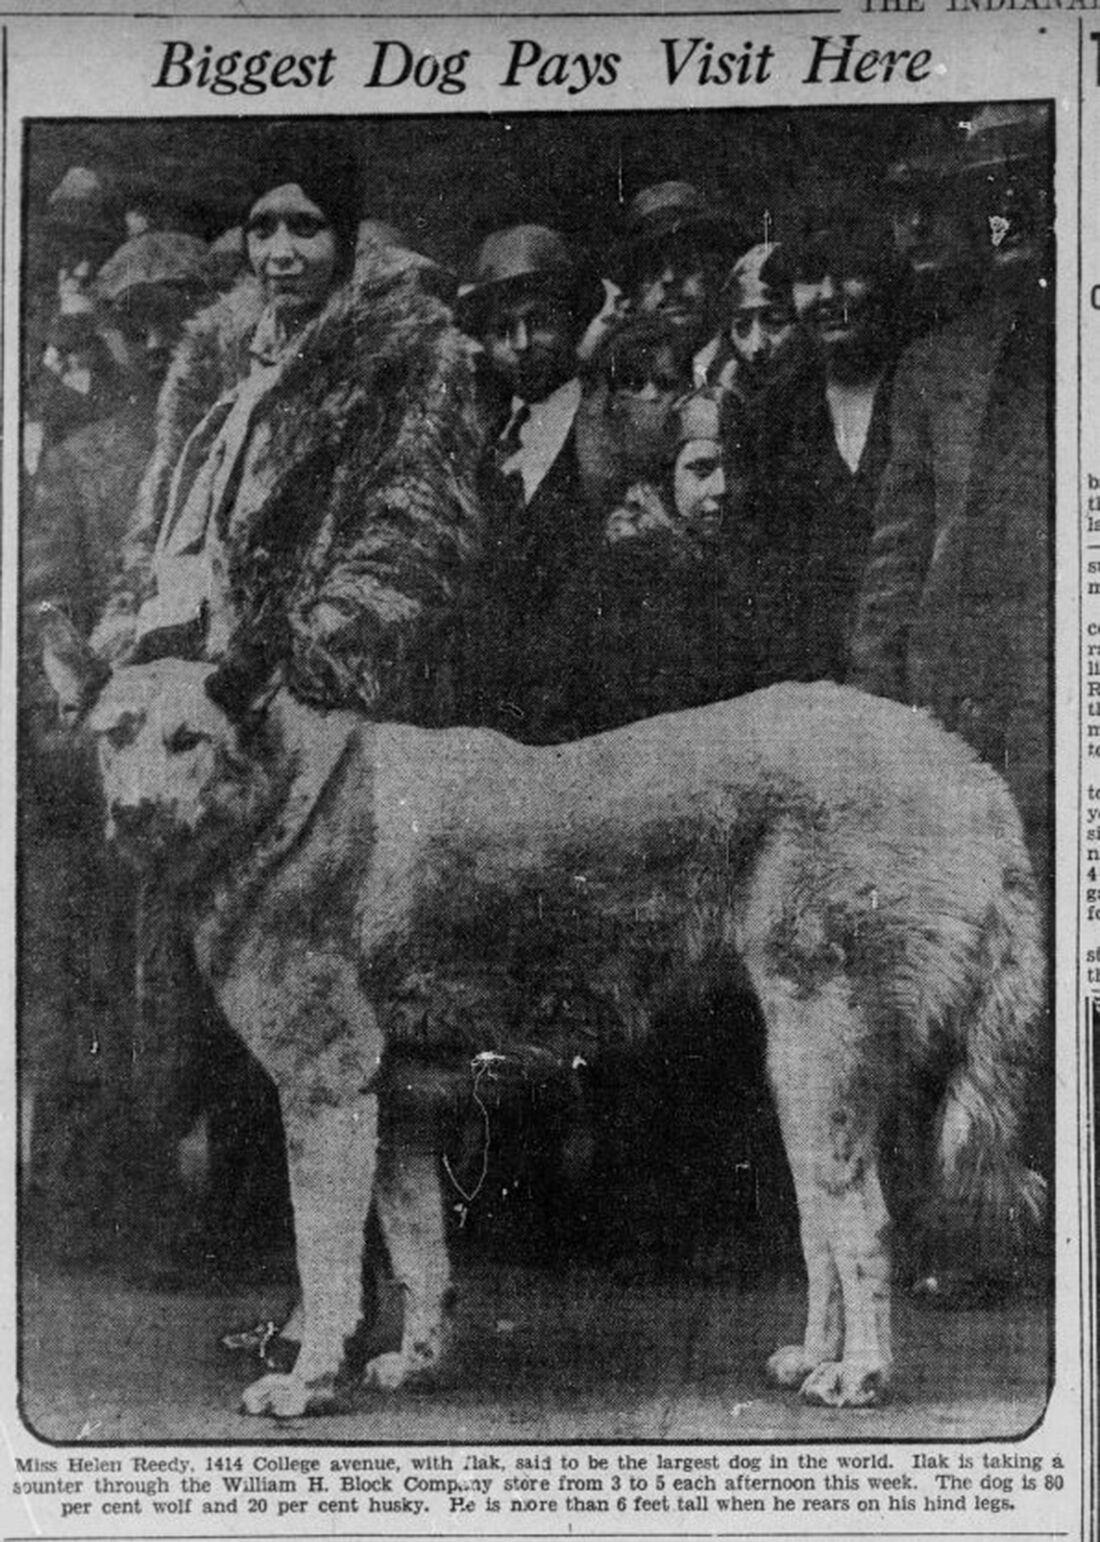 Ilak photo Indanopolis Times 1-14-1929